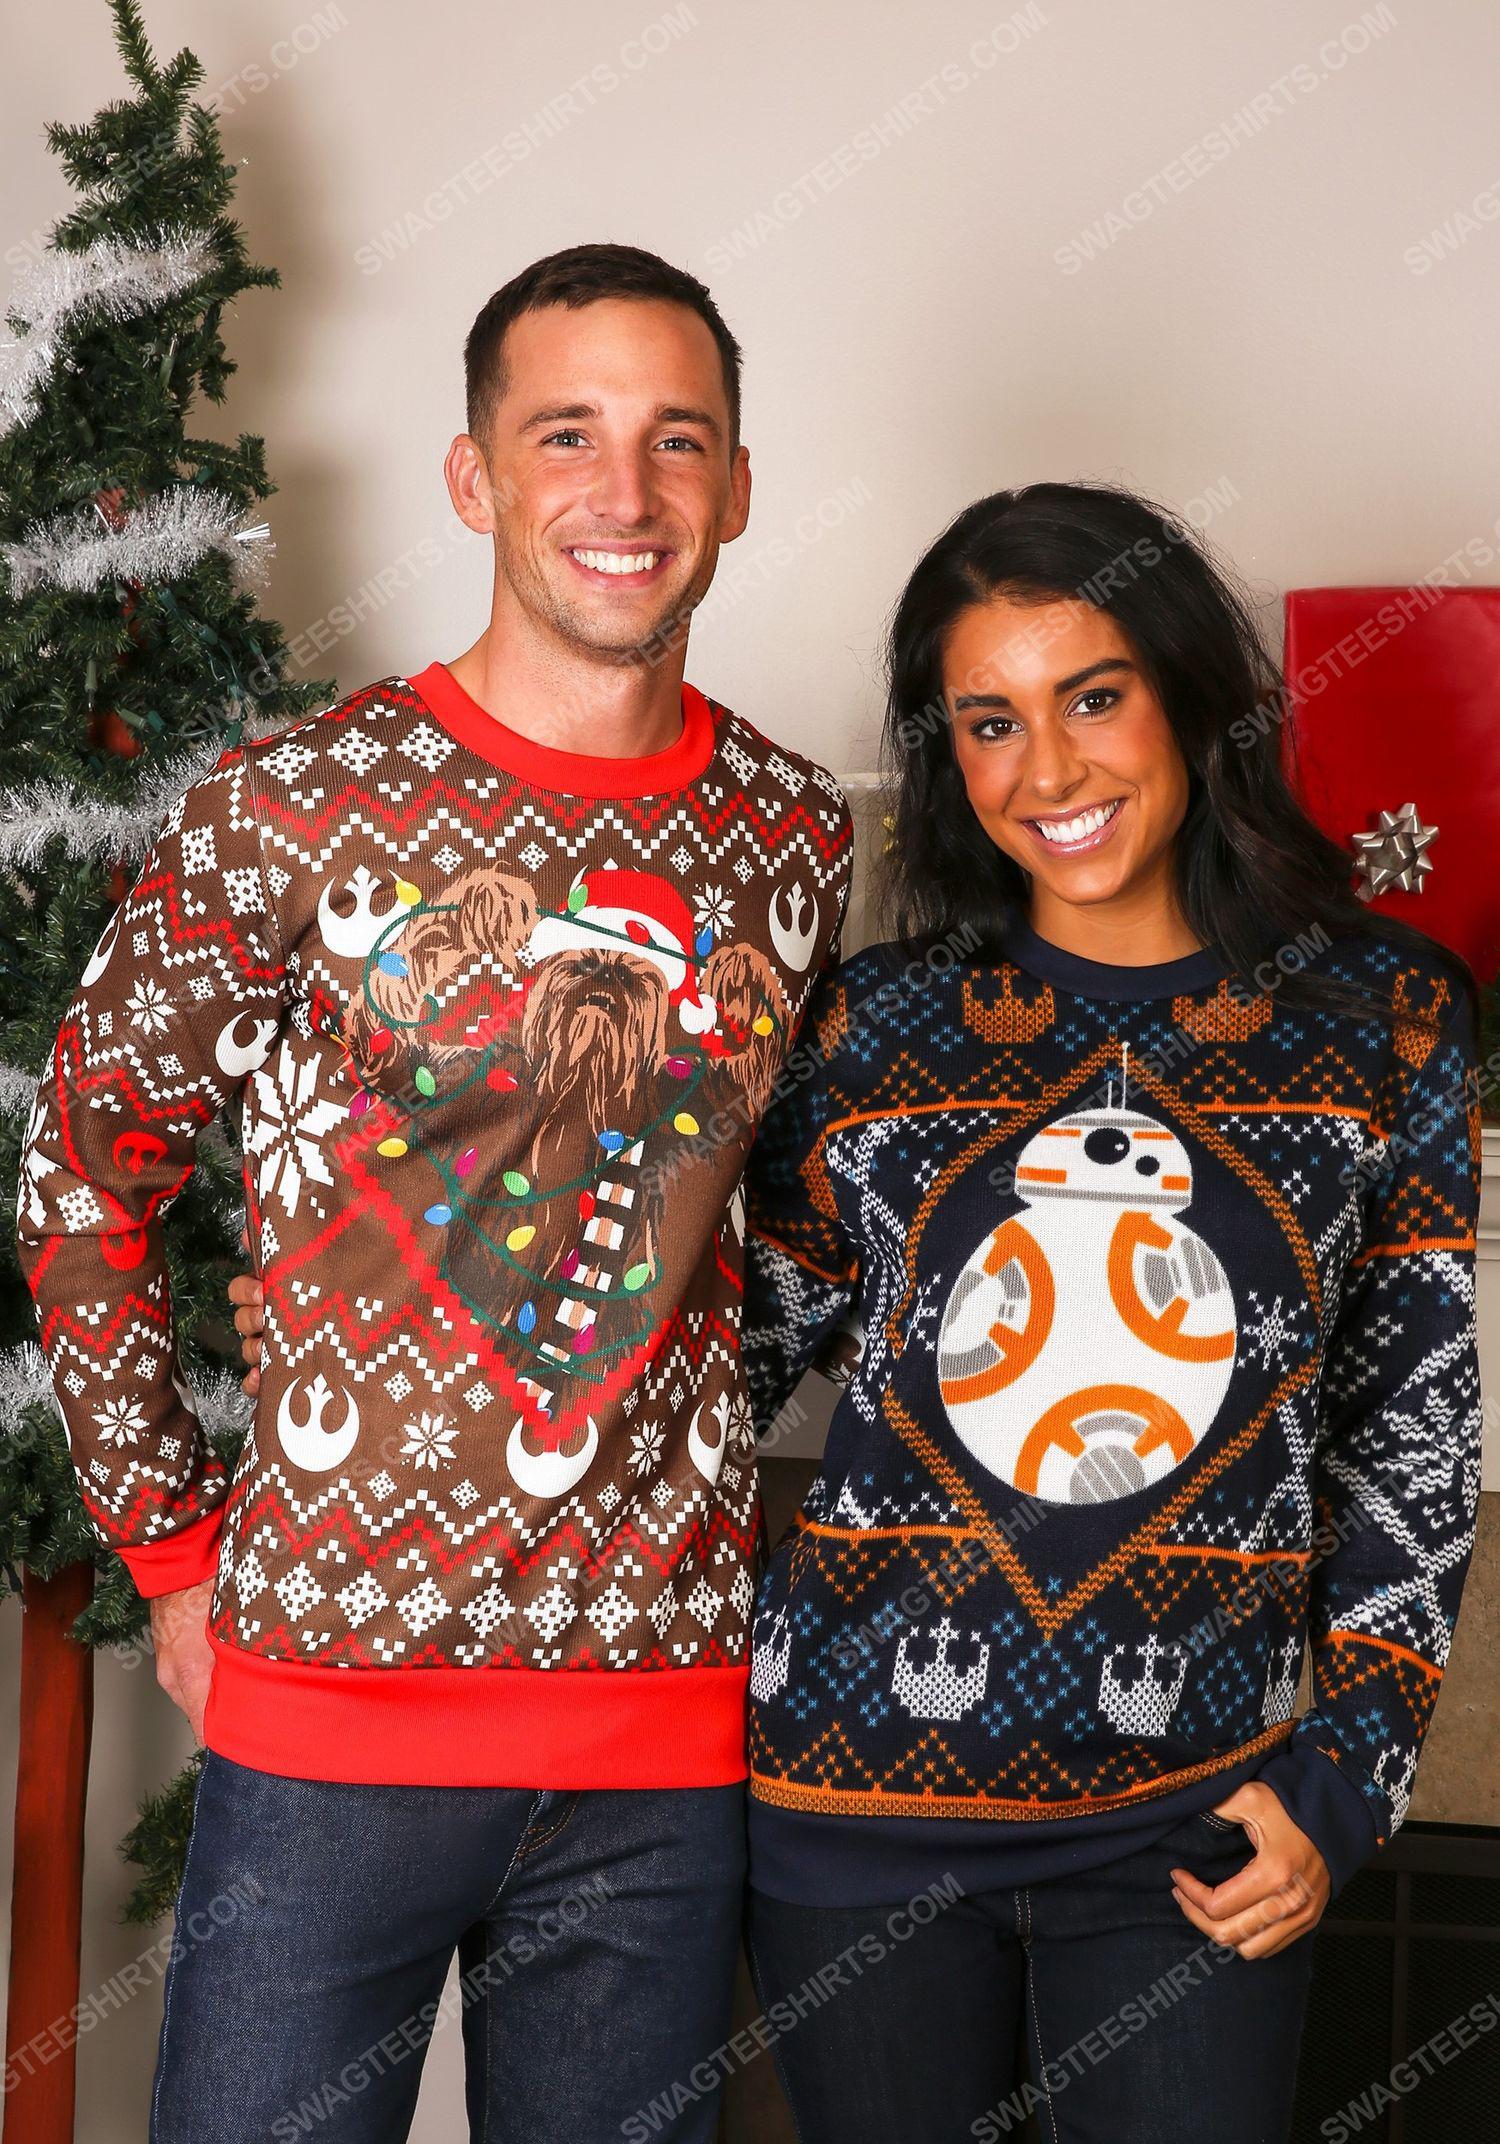 Star wars chewbacca lights full print ugly christmas sweater 4